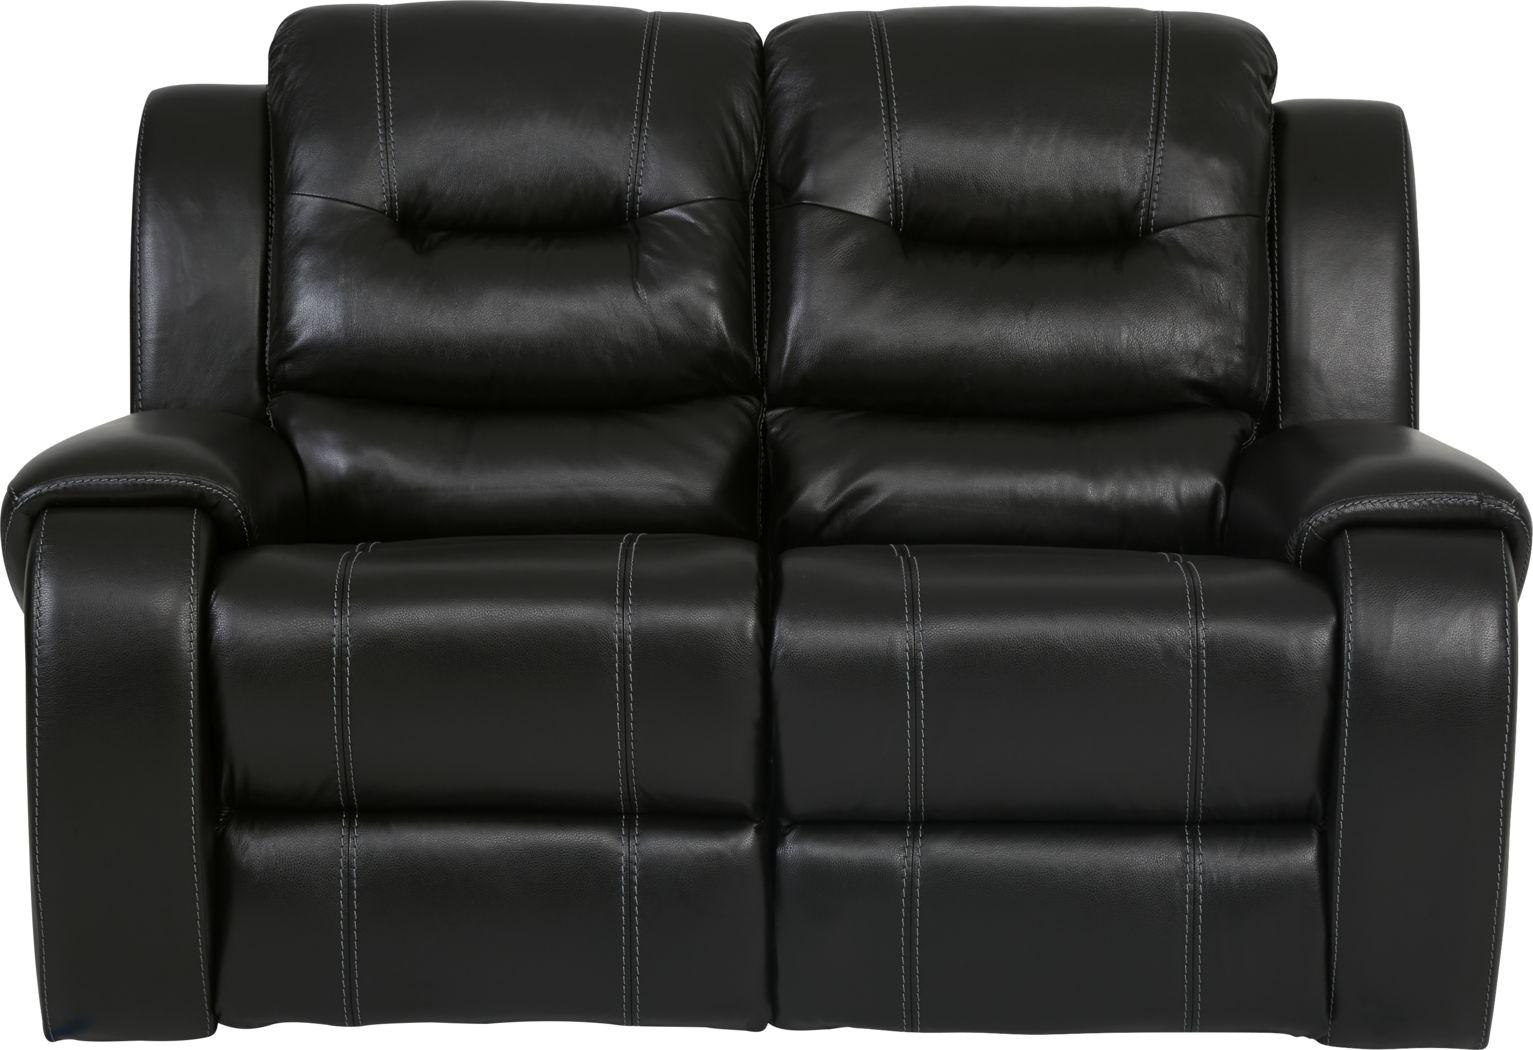 High Plains Black Leather Loveseat